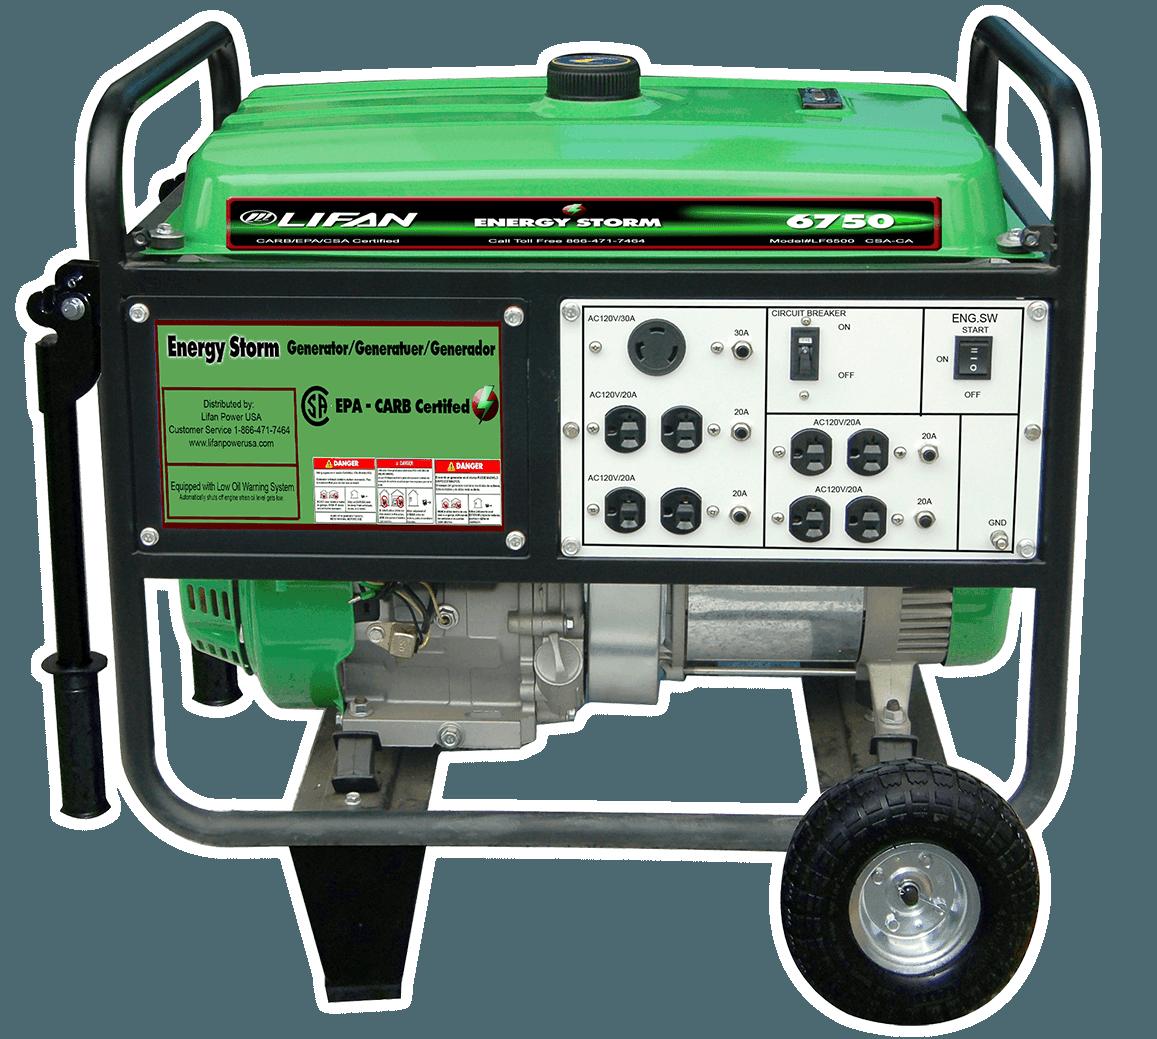 Lifan Generators 3600 Wiring Diagram 250 Energy Storm 6750 Power Usa Rh Lifanpowerusa Com Engine 250cc